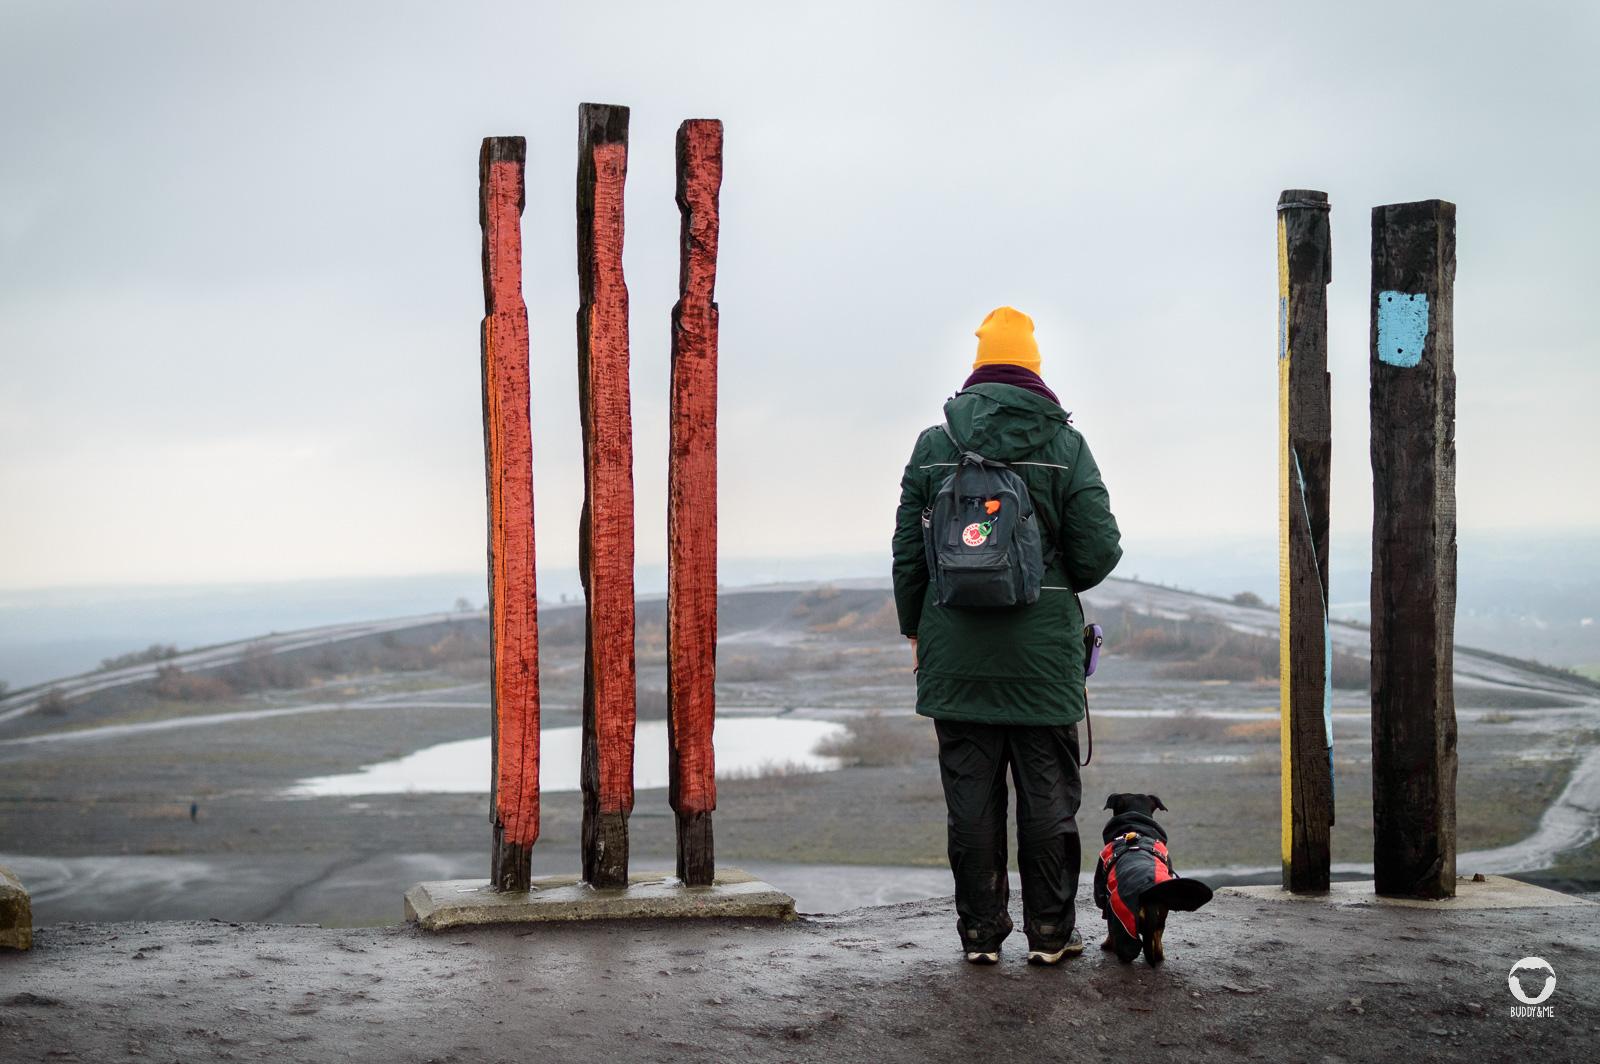 Aussicht Halde Haniel - Pinscher Buddy, Buddy and Me, Hundeblog, Dogblog, Ruhrgebiet, Leben mit Hund, Hundealltag, Bewegung, Glück, Team, Gemeinsam